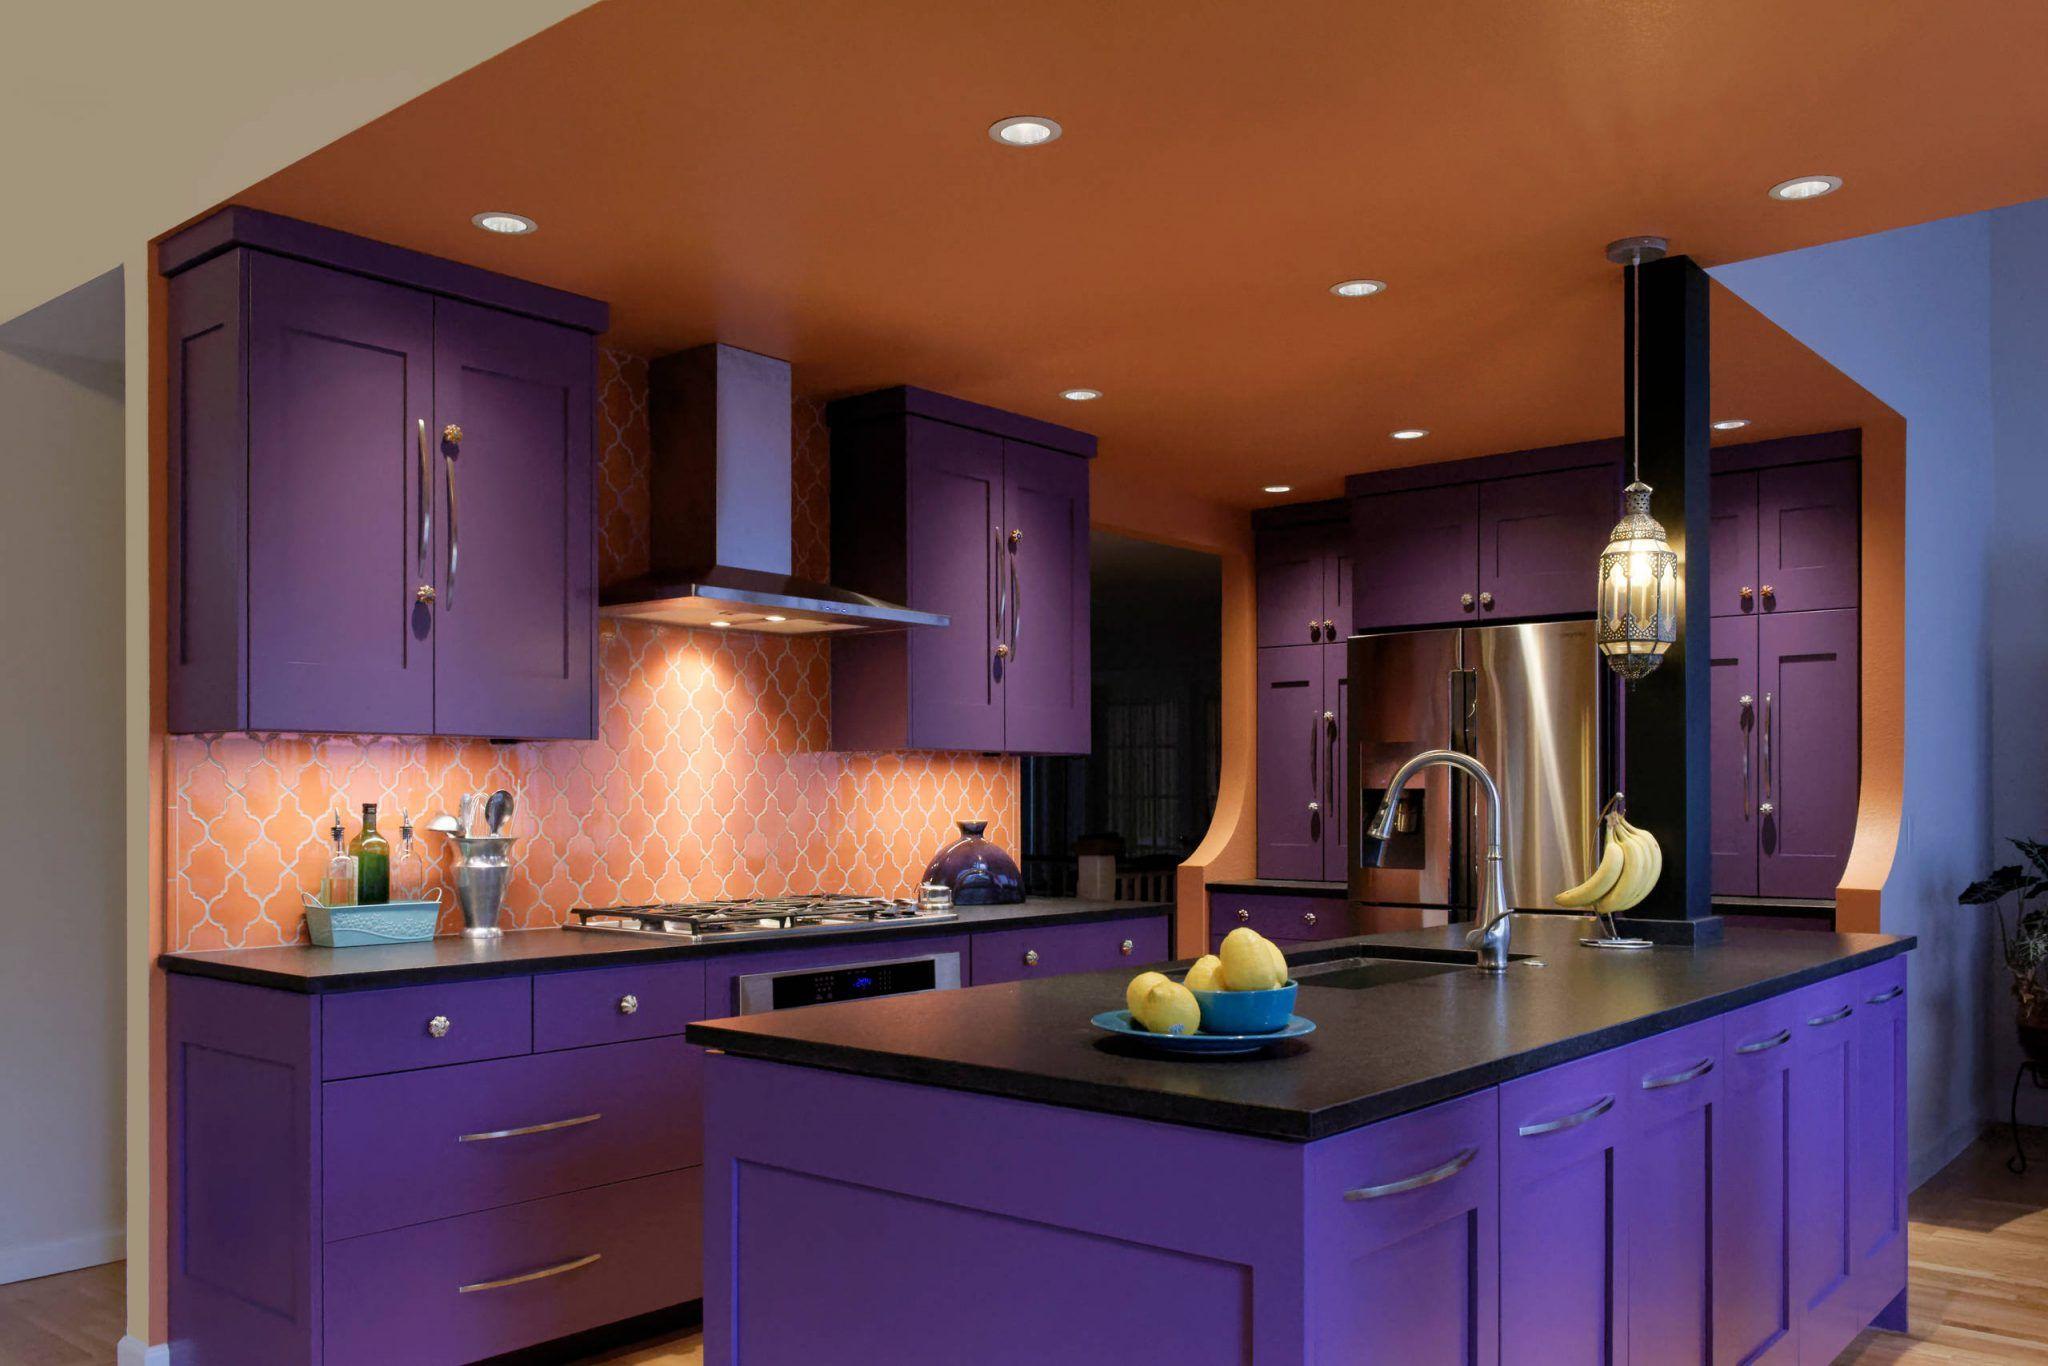 Purple Kitchen Cabinets Shaker Style Purple Kitchen Cabinets Purple Kitchen Kitchen Cabinets